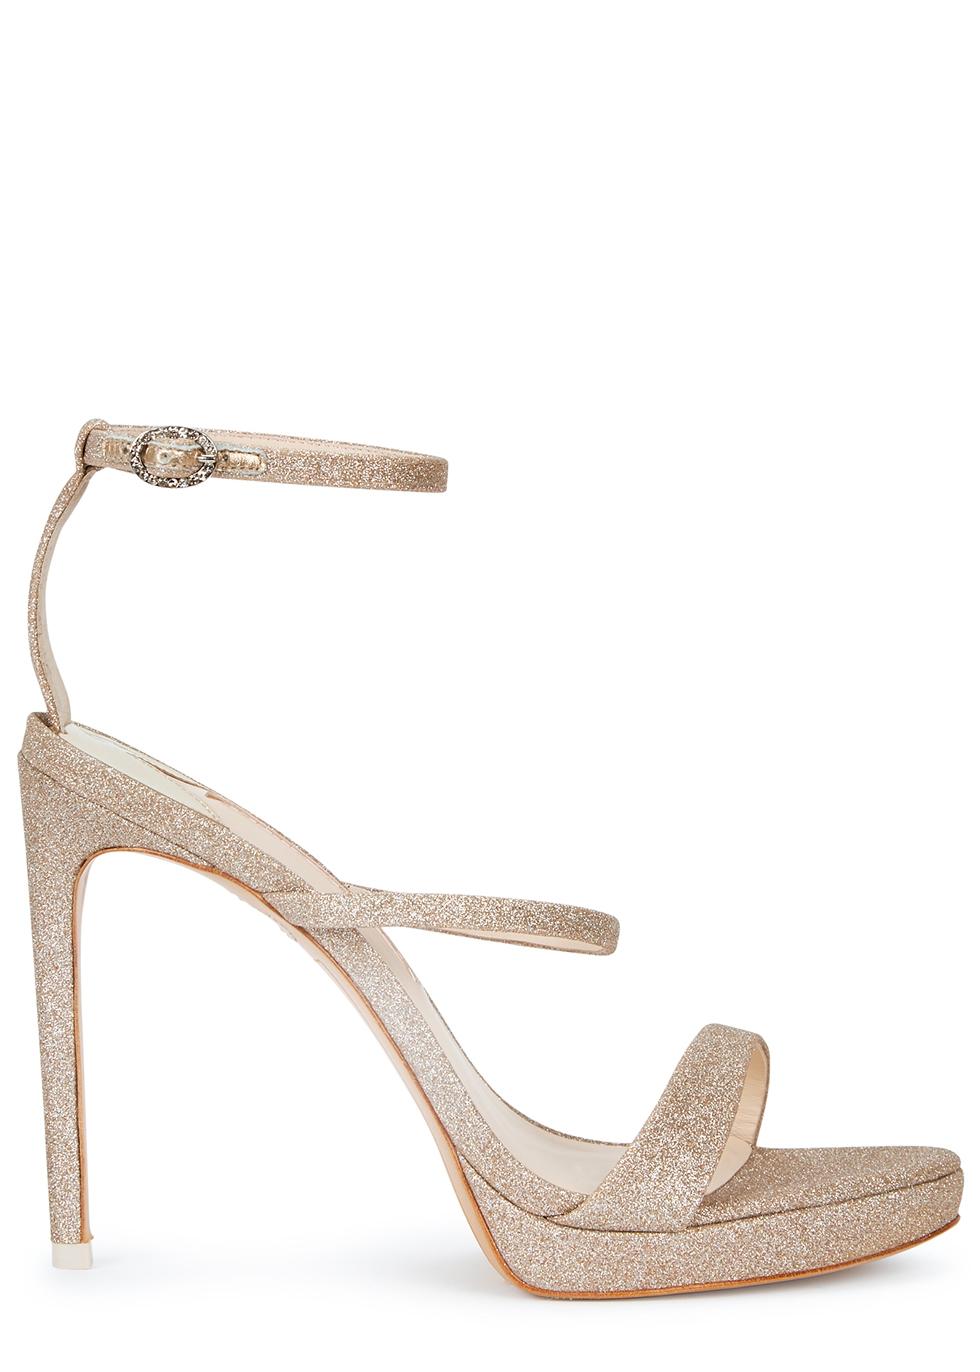 Rosalind 100 gold glittered leather sandals